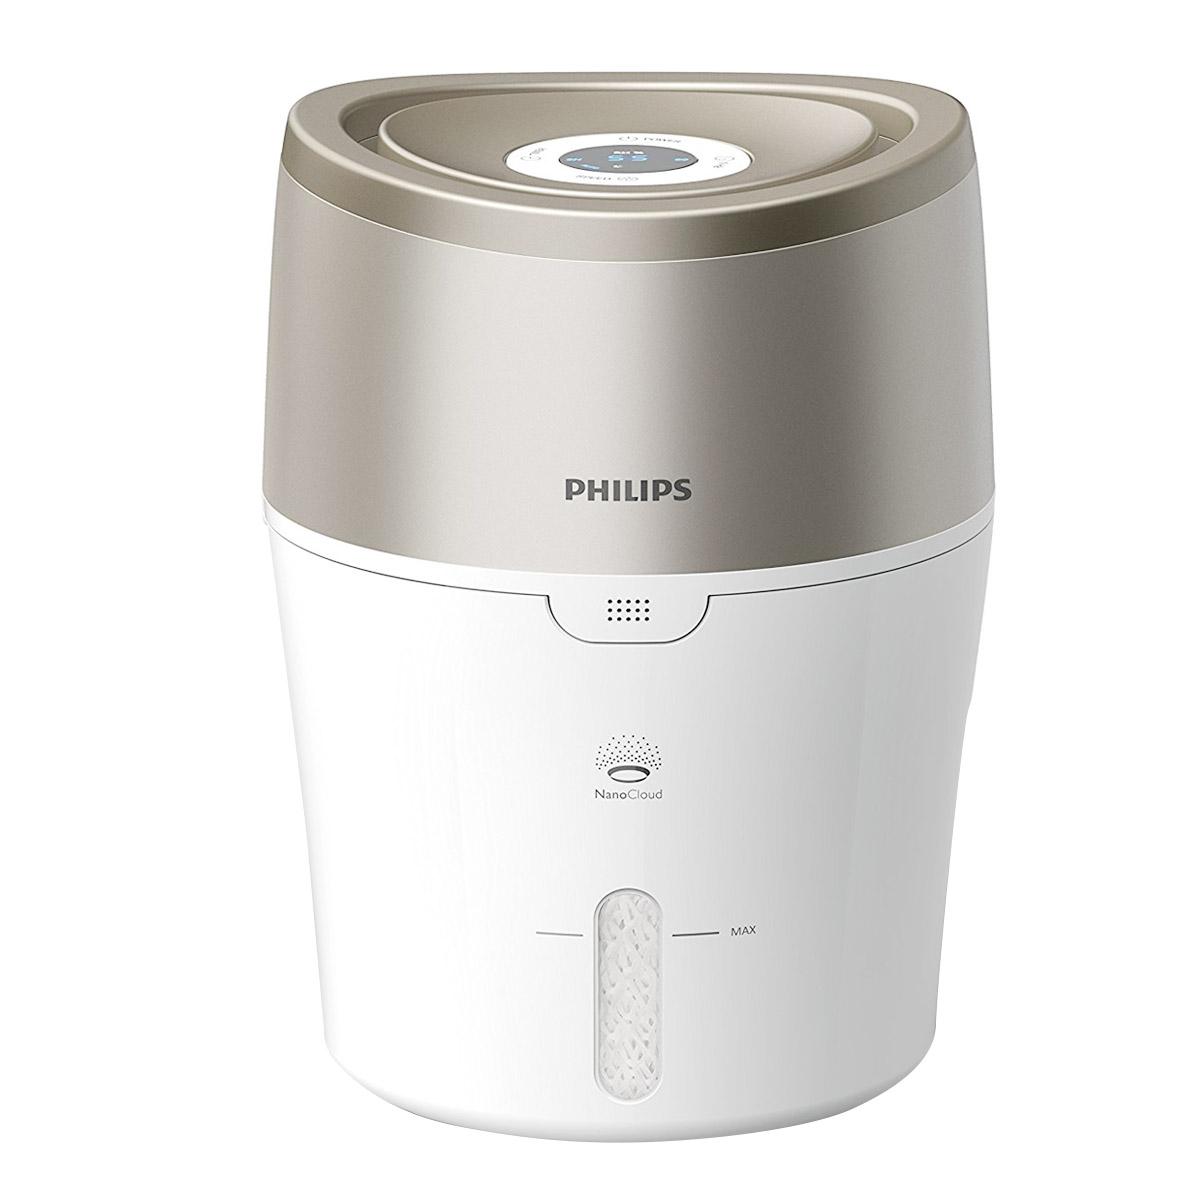 Philips NanoCloud Air Humidifier